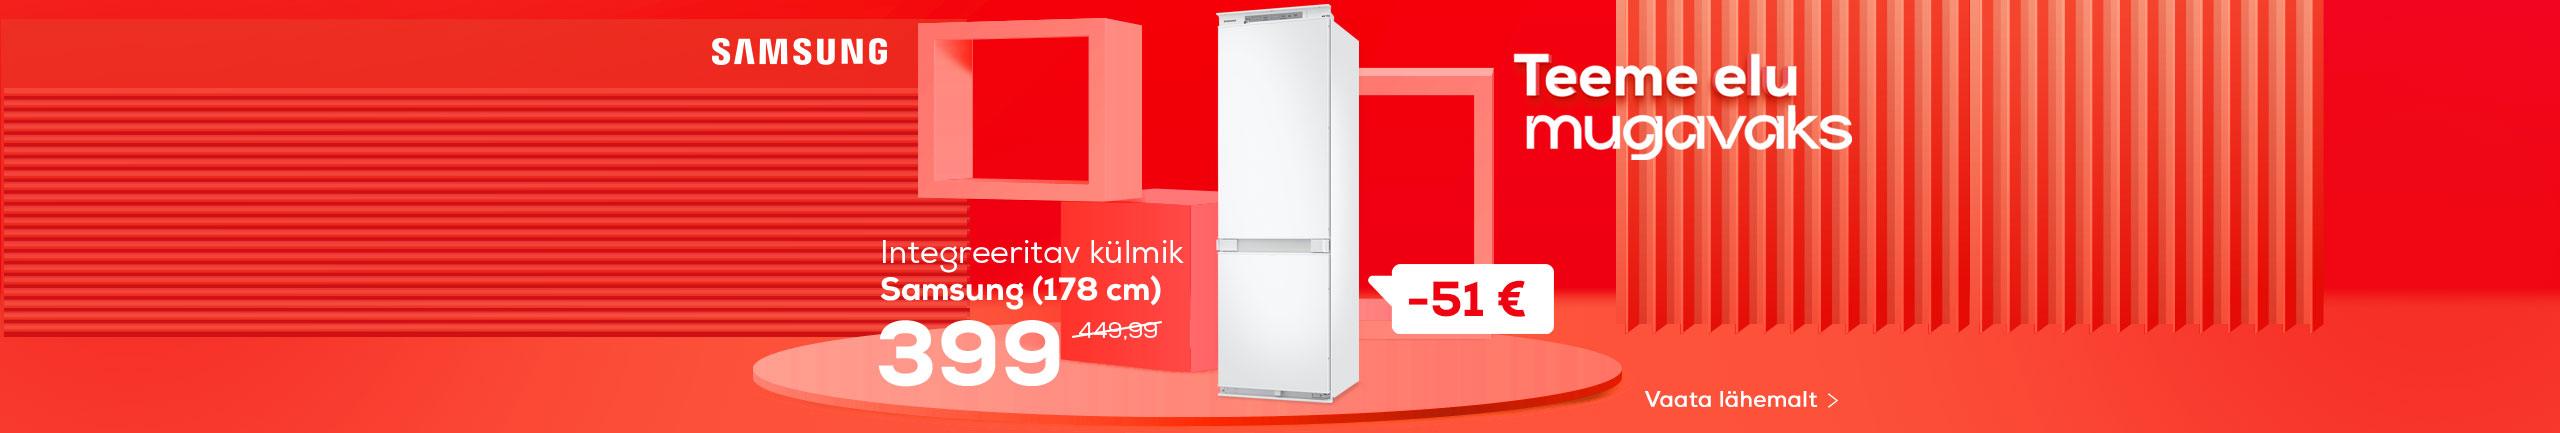 NPL We make life easy! Built-in refrigerator Samsung